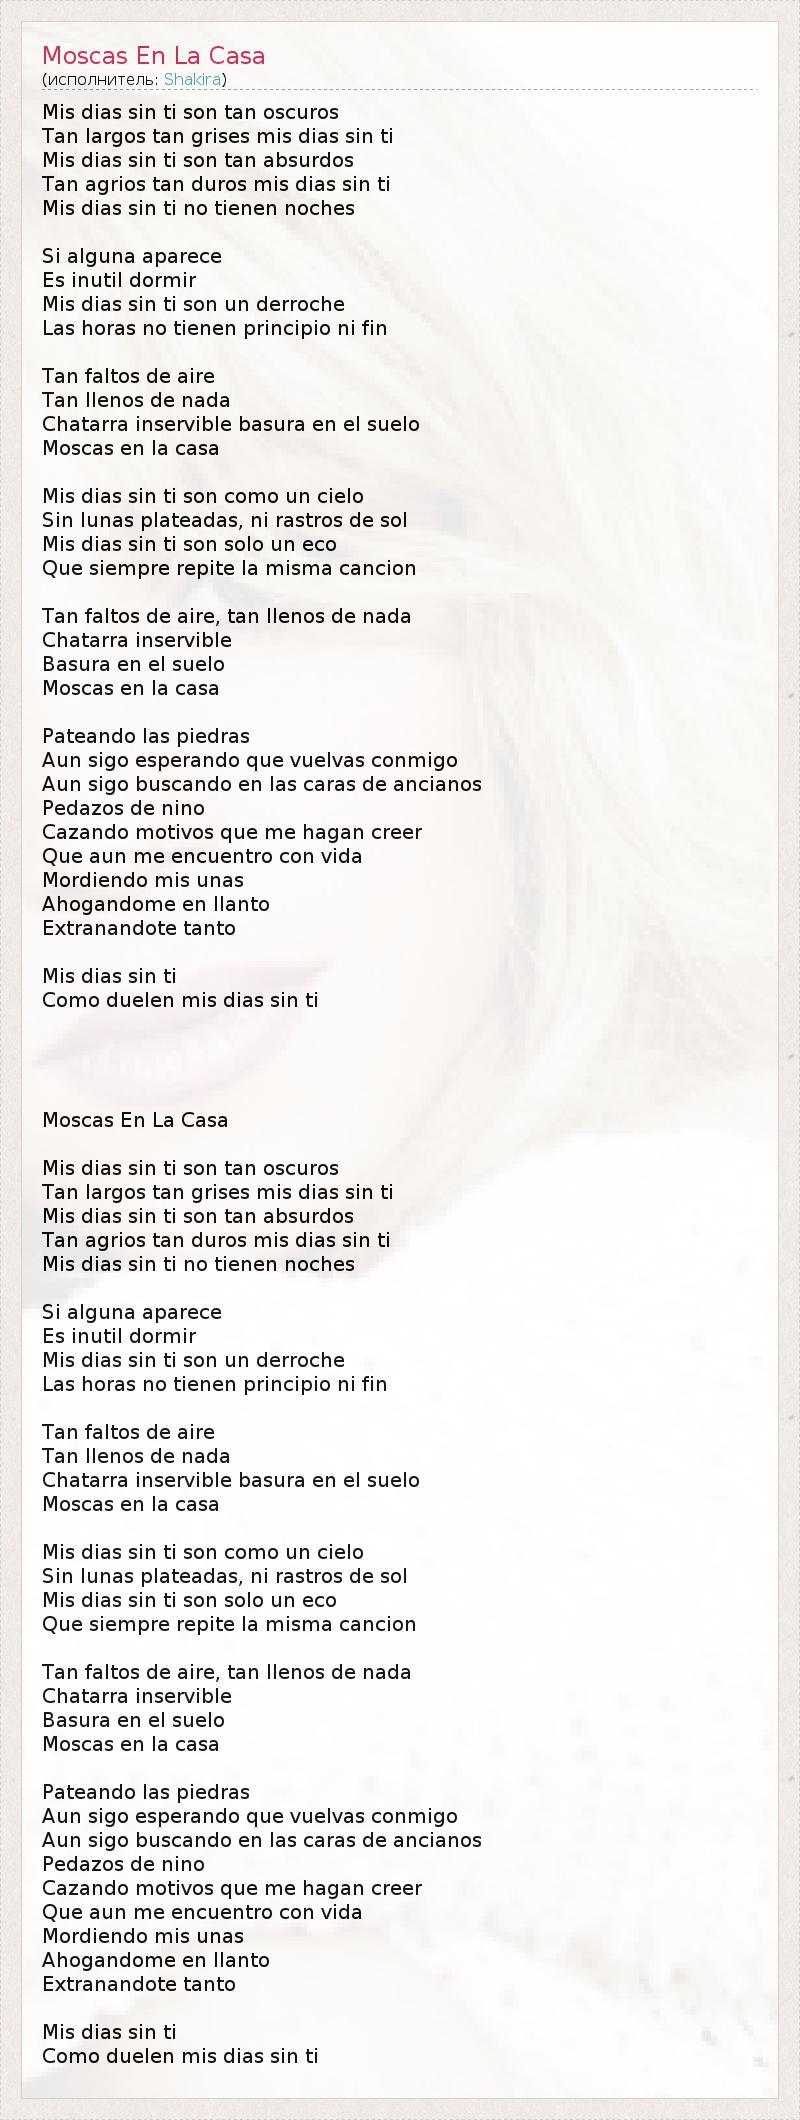 текст песни Moscas En La Casa слова песни